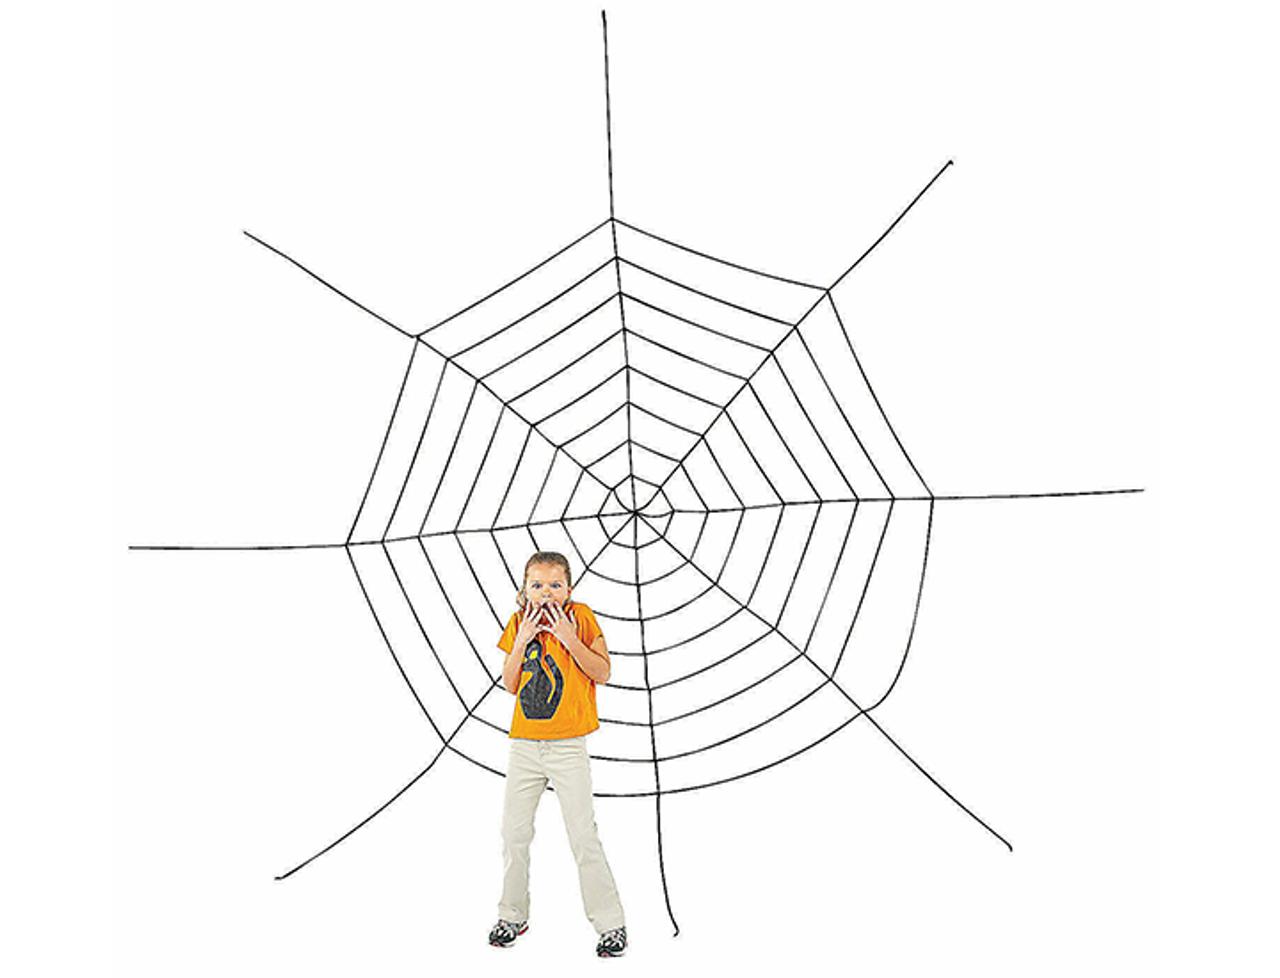 Jumbo 11-Foot Spiderweb Creepy Halloween Decoration! .99 (REG .99) at Until Gone!